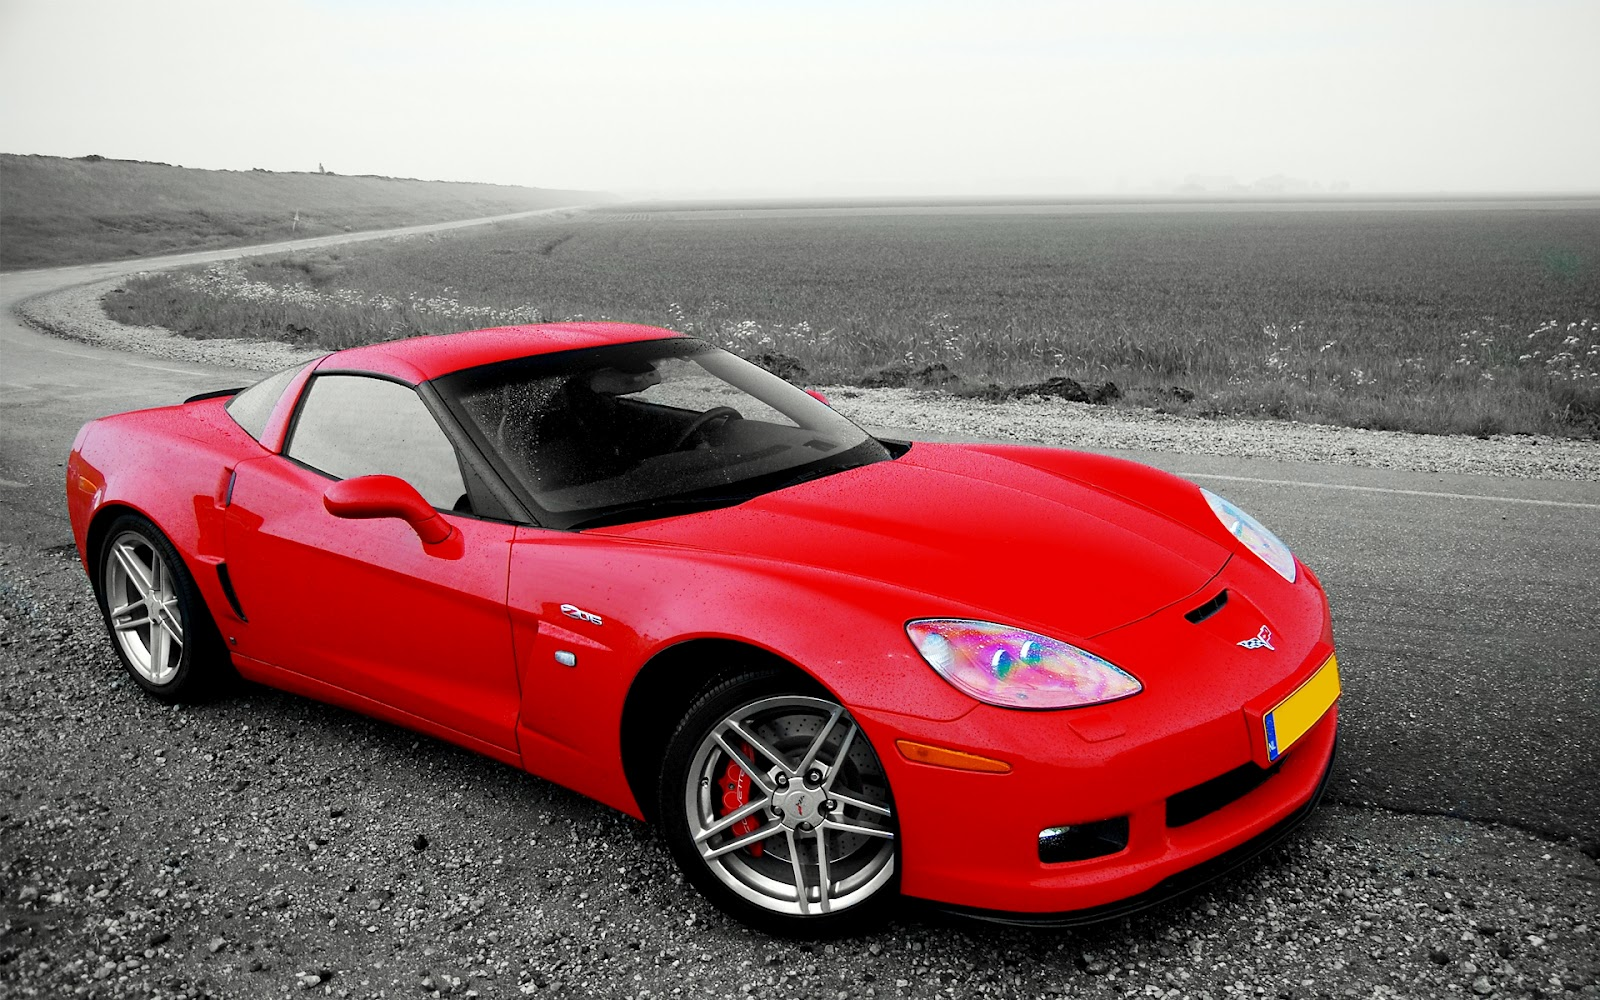 http://1.bp.blogspot.com/-7zZkvekGq00/T-2PFLrihXI/AAAAAAAAAg8/spmEUHYxyHc/s1600/chevrolet+corvette+z06+%287%29.jpg